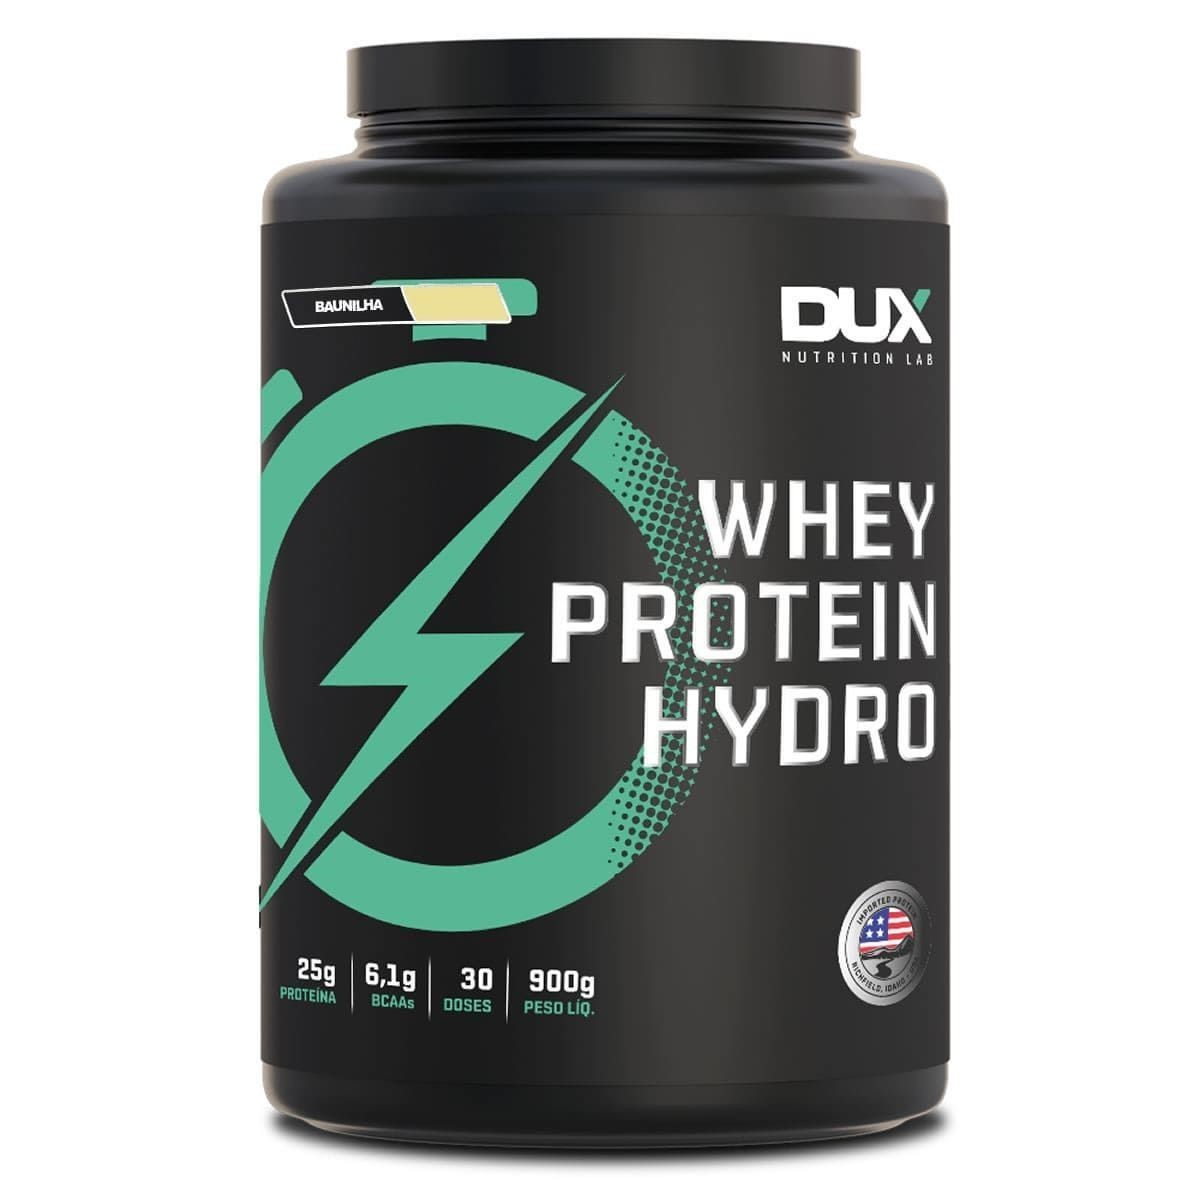 Whey Protein Hydro Dux - 900g